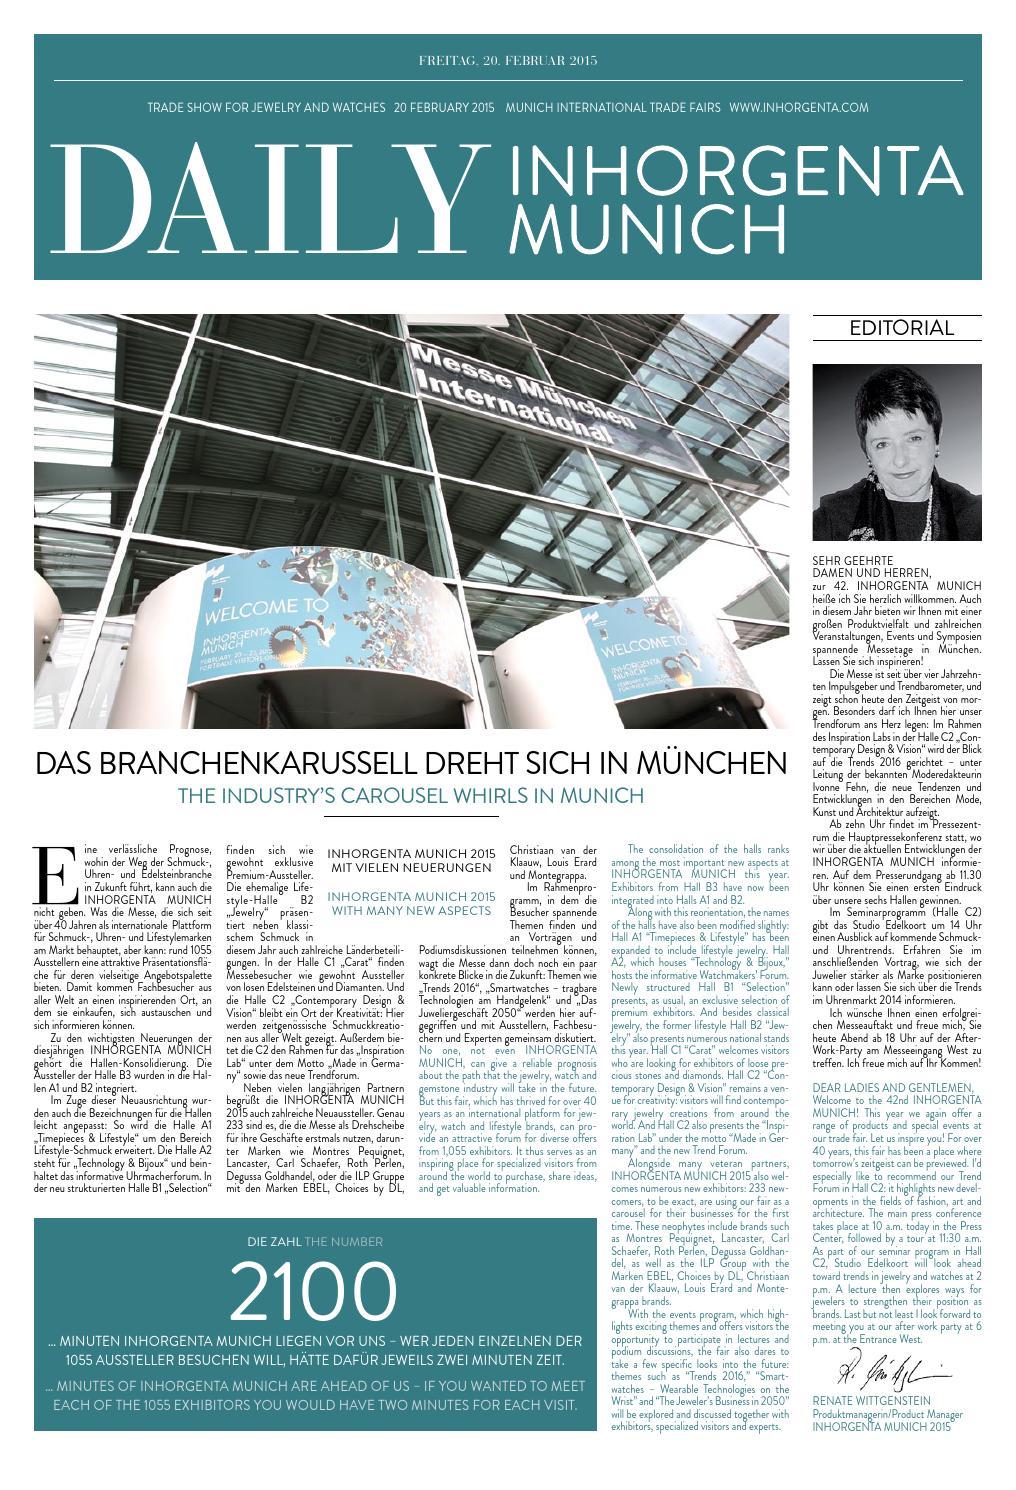 Daily News Inorgenta Munich Freitag By Katrin Falkenberg